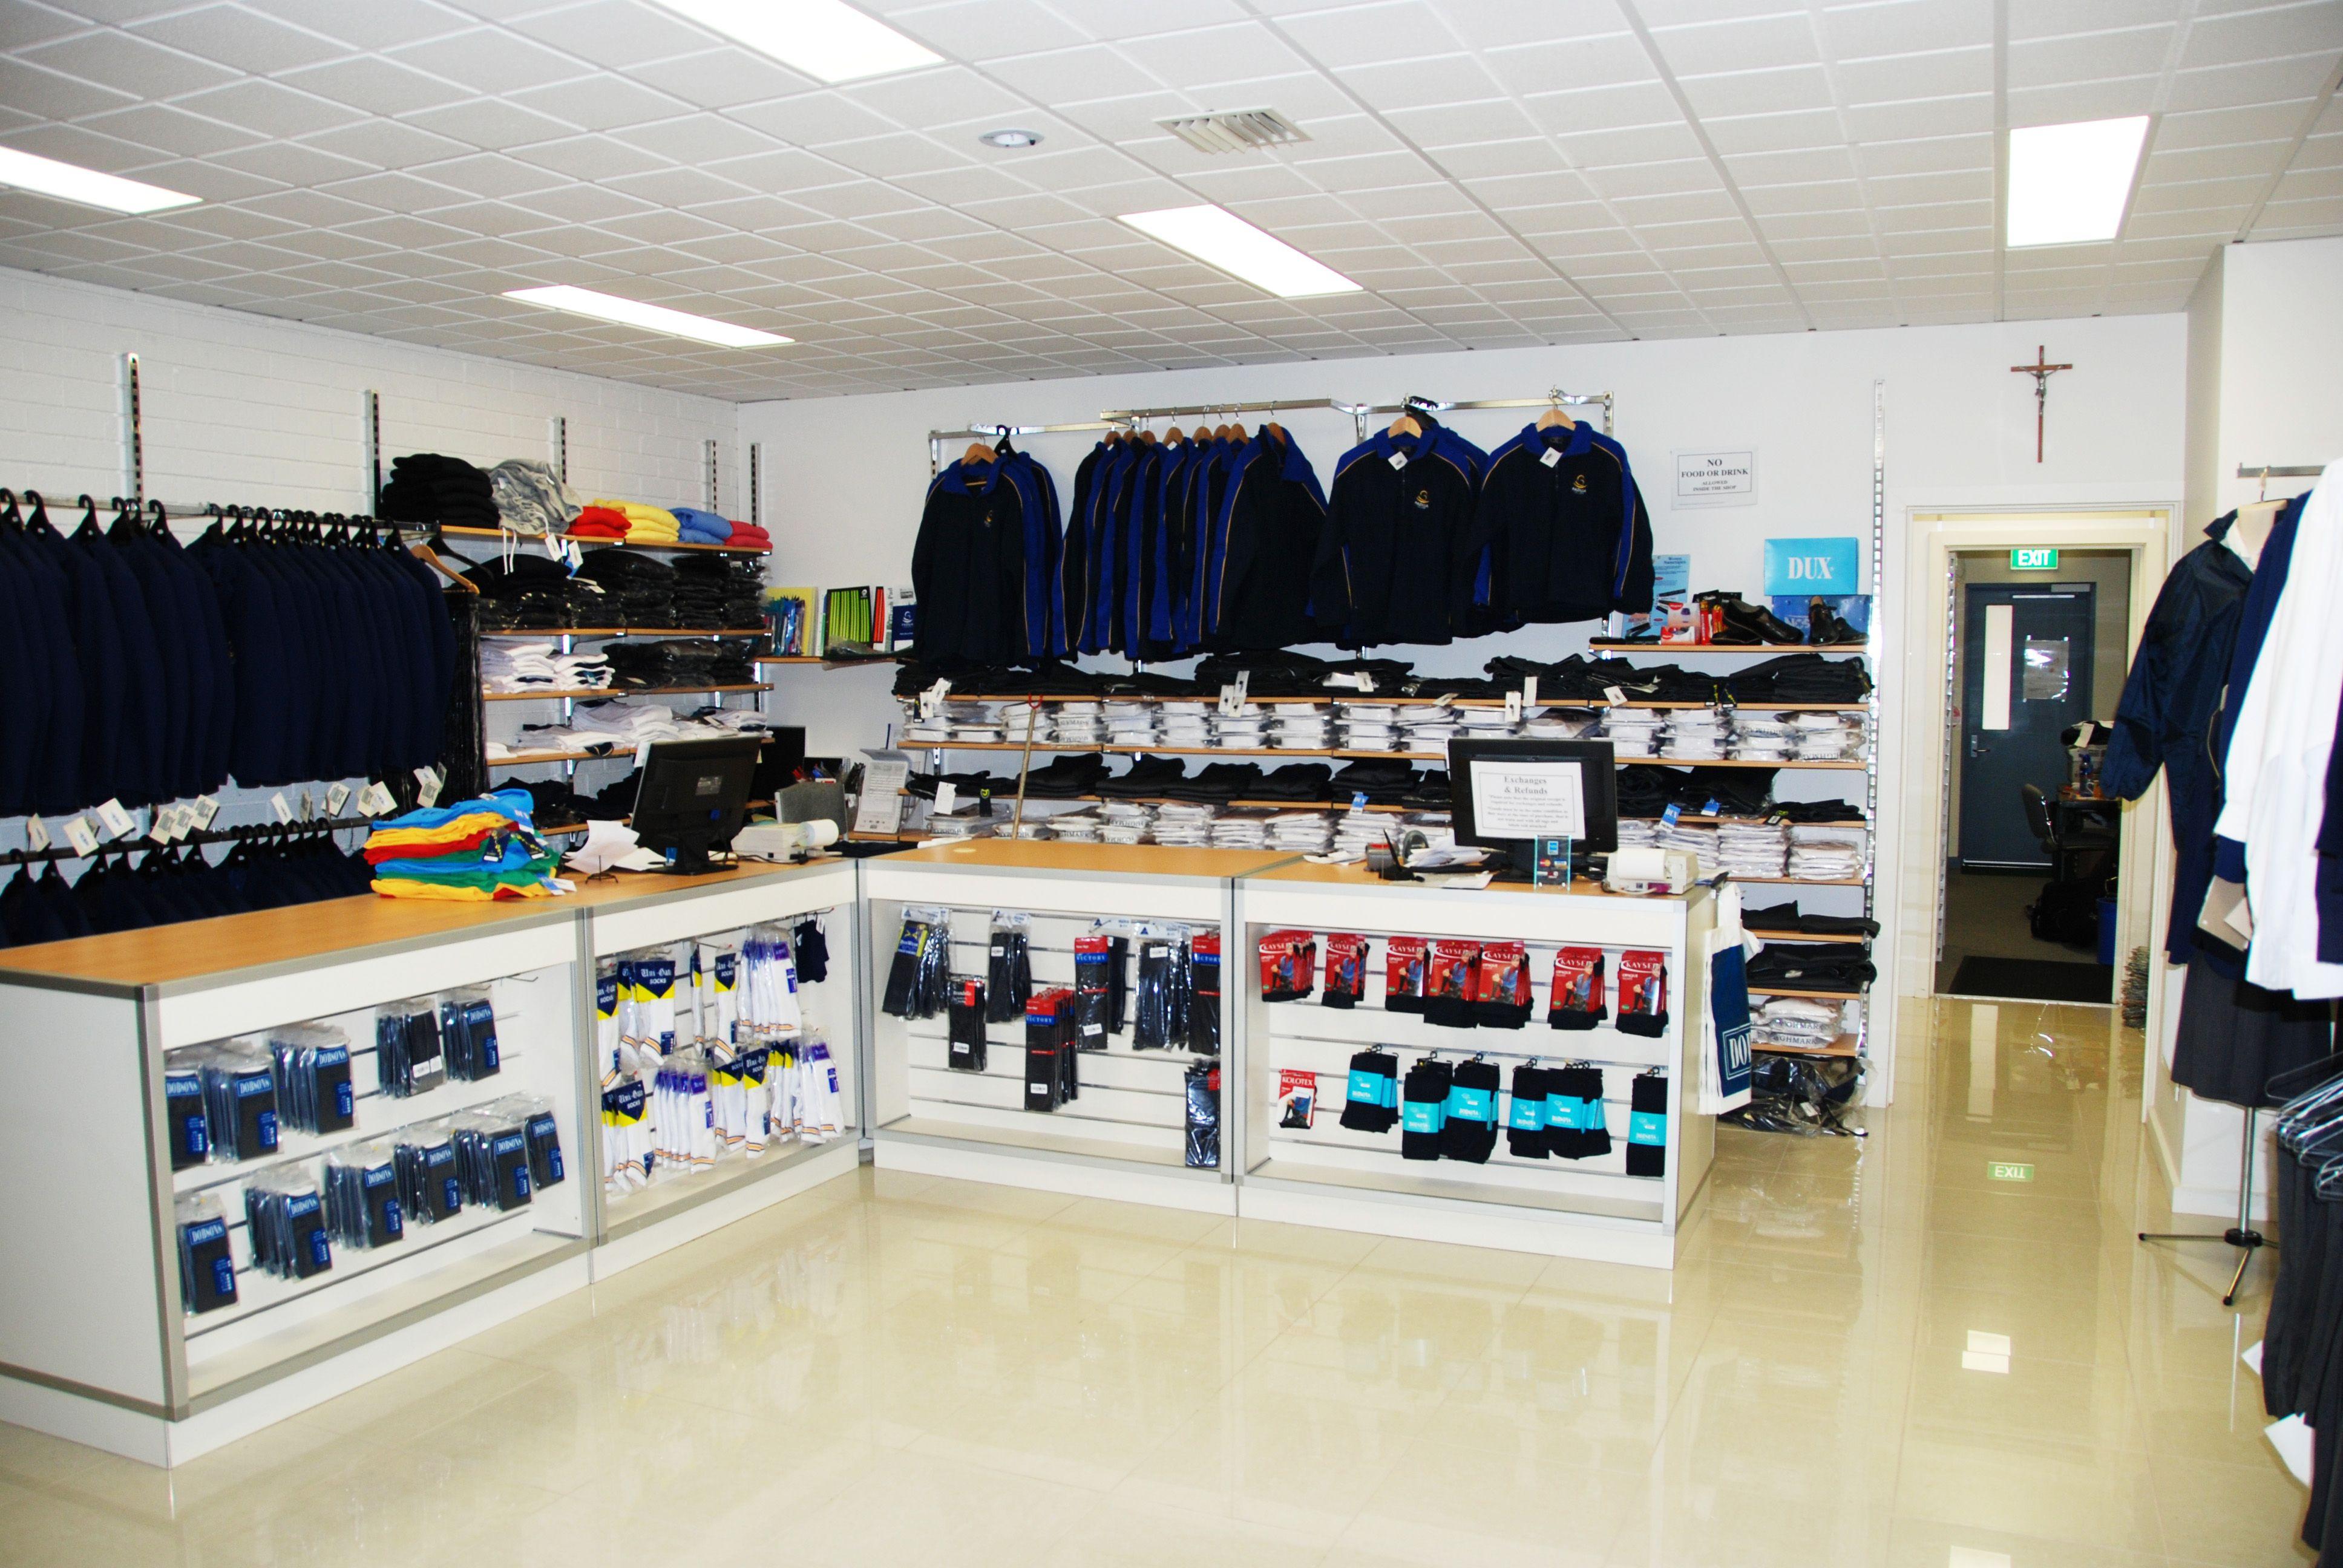 cbb3b81b4a We Can Help Manage Your School Uniform Shop in 2019